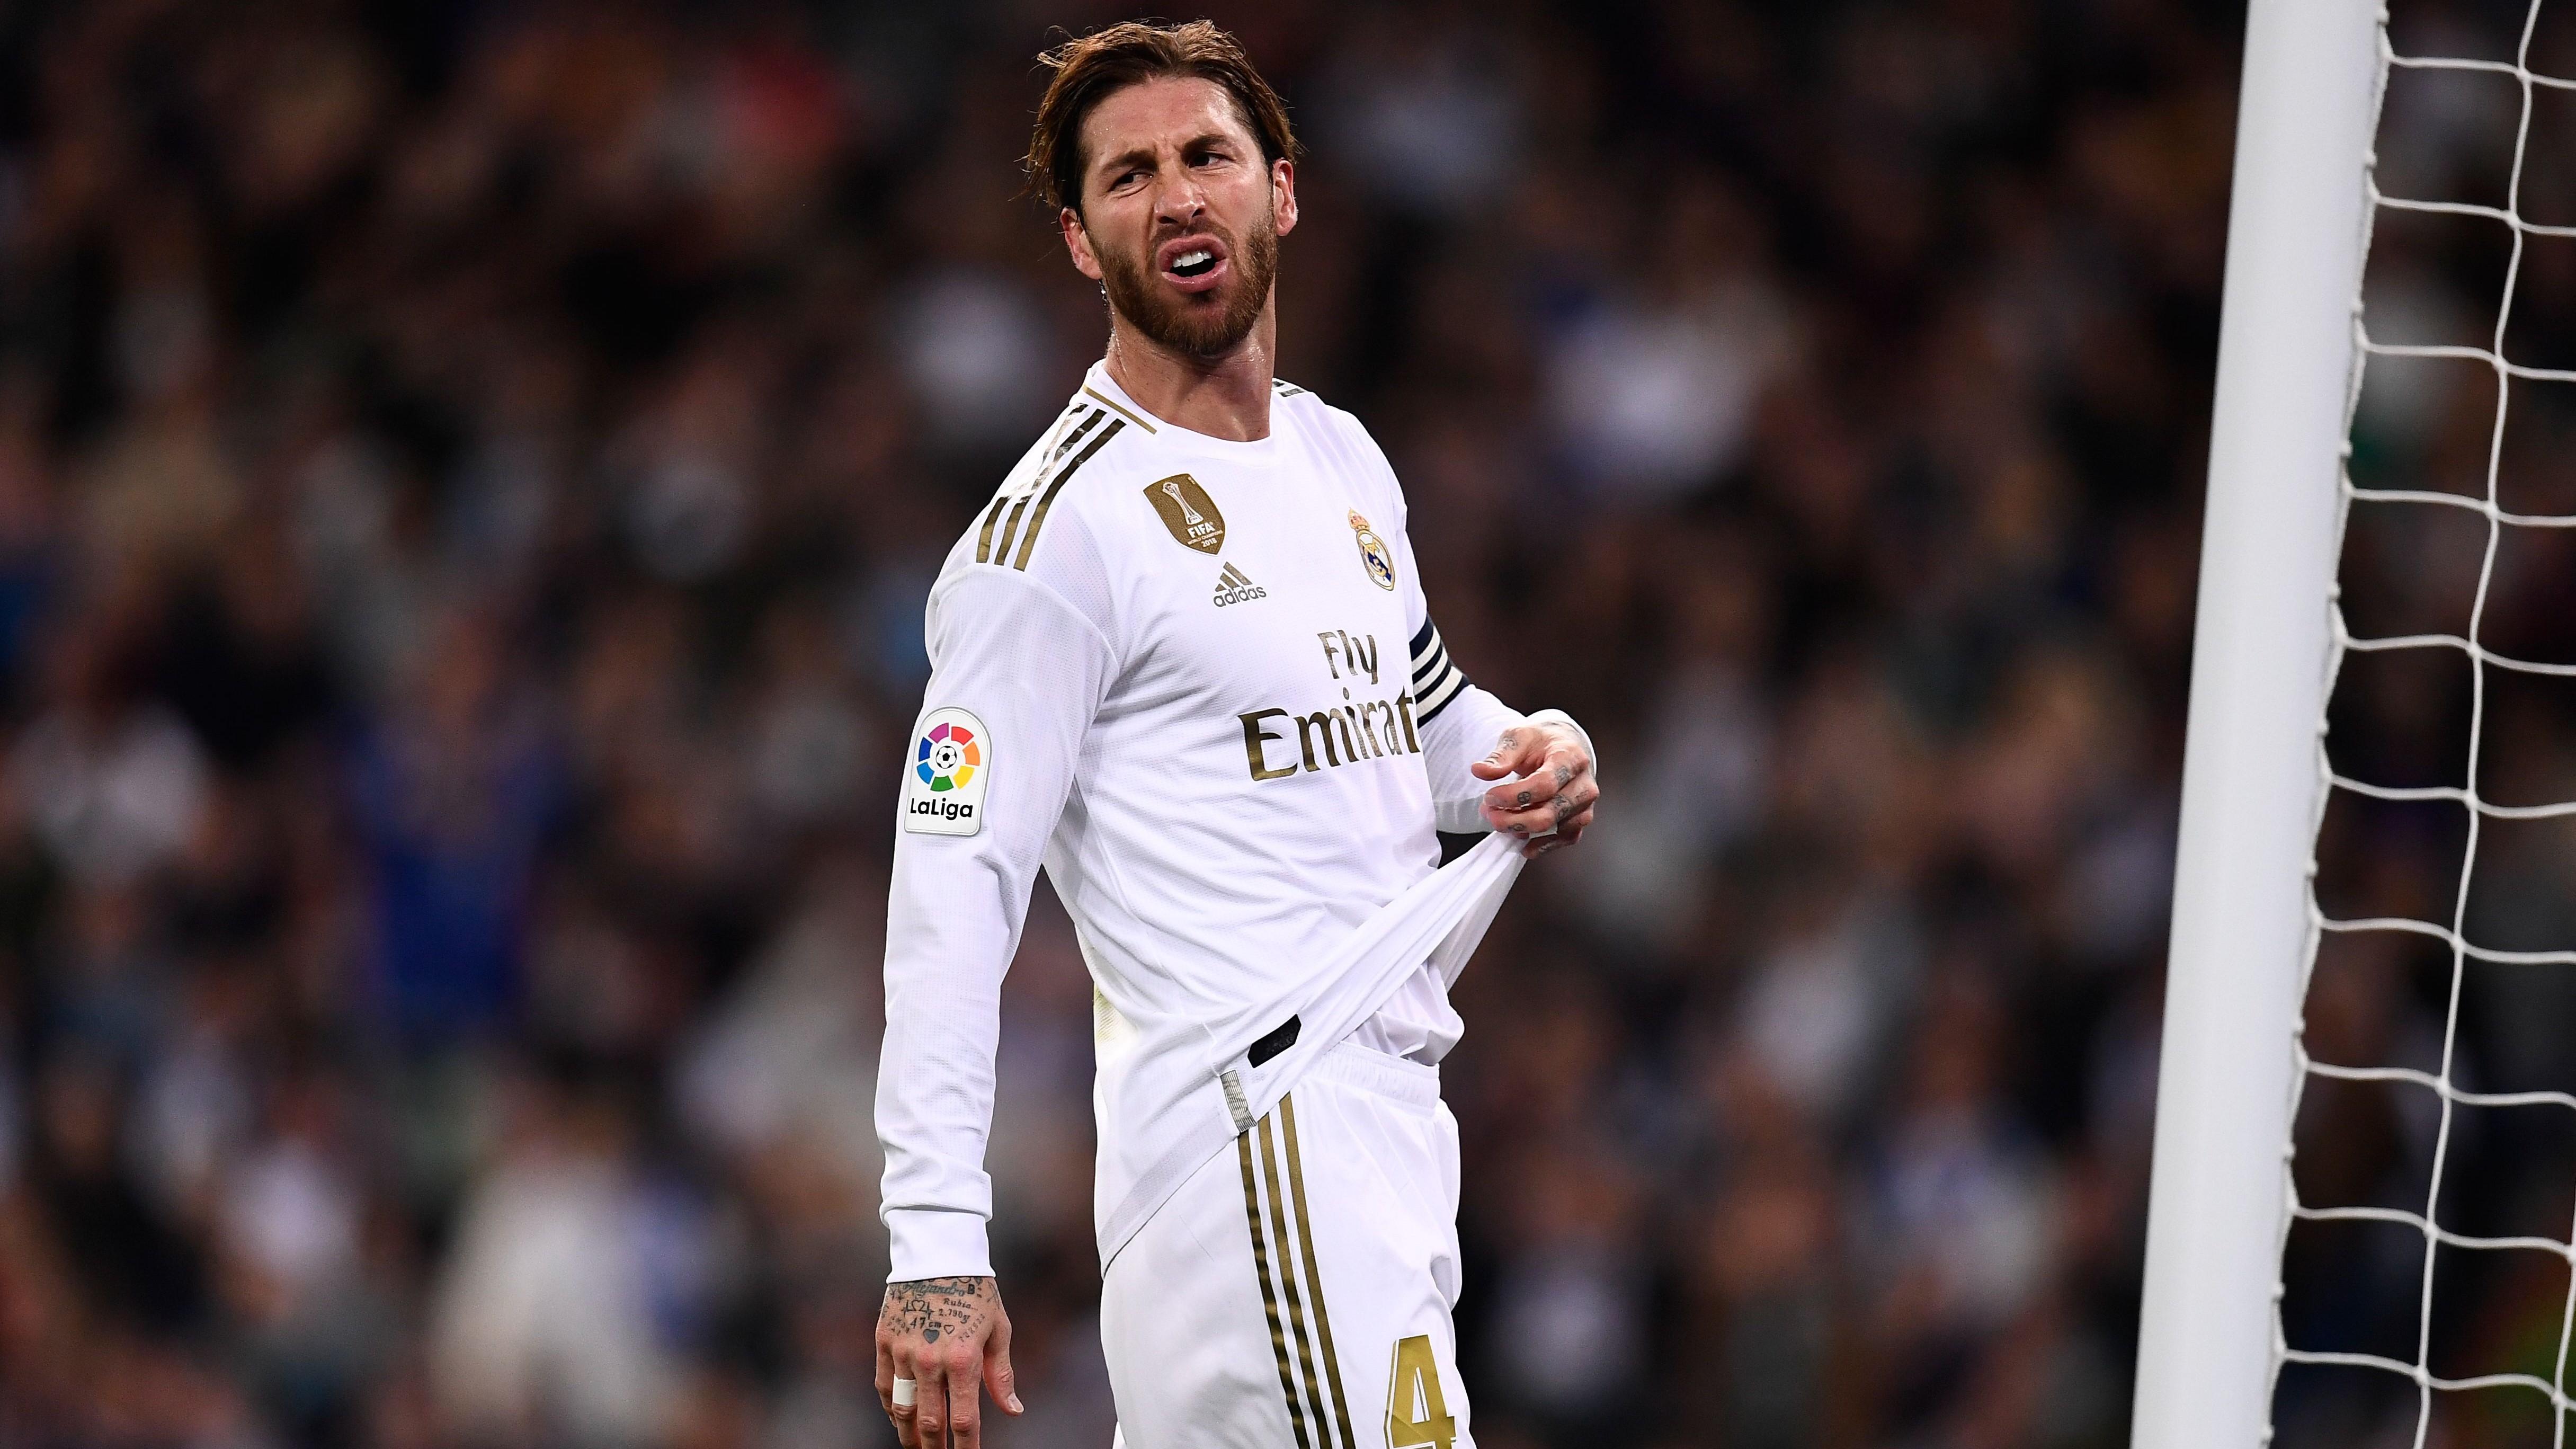 Real Madrid - Sergio Ramos déçu après le nul face au Bétis